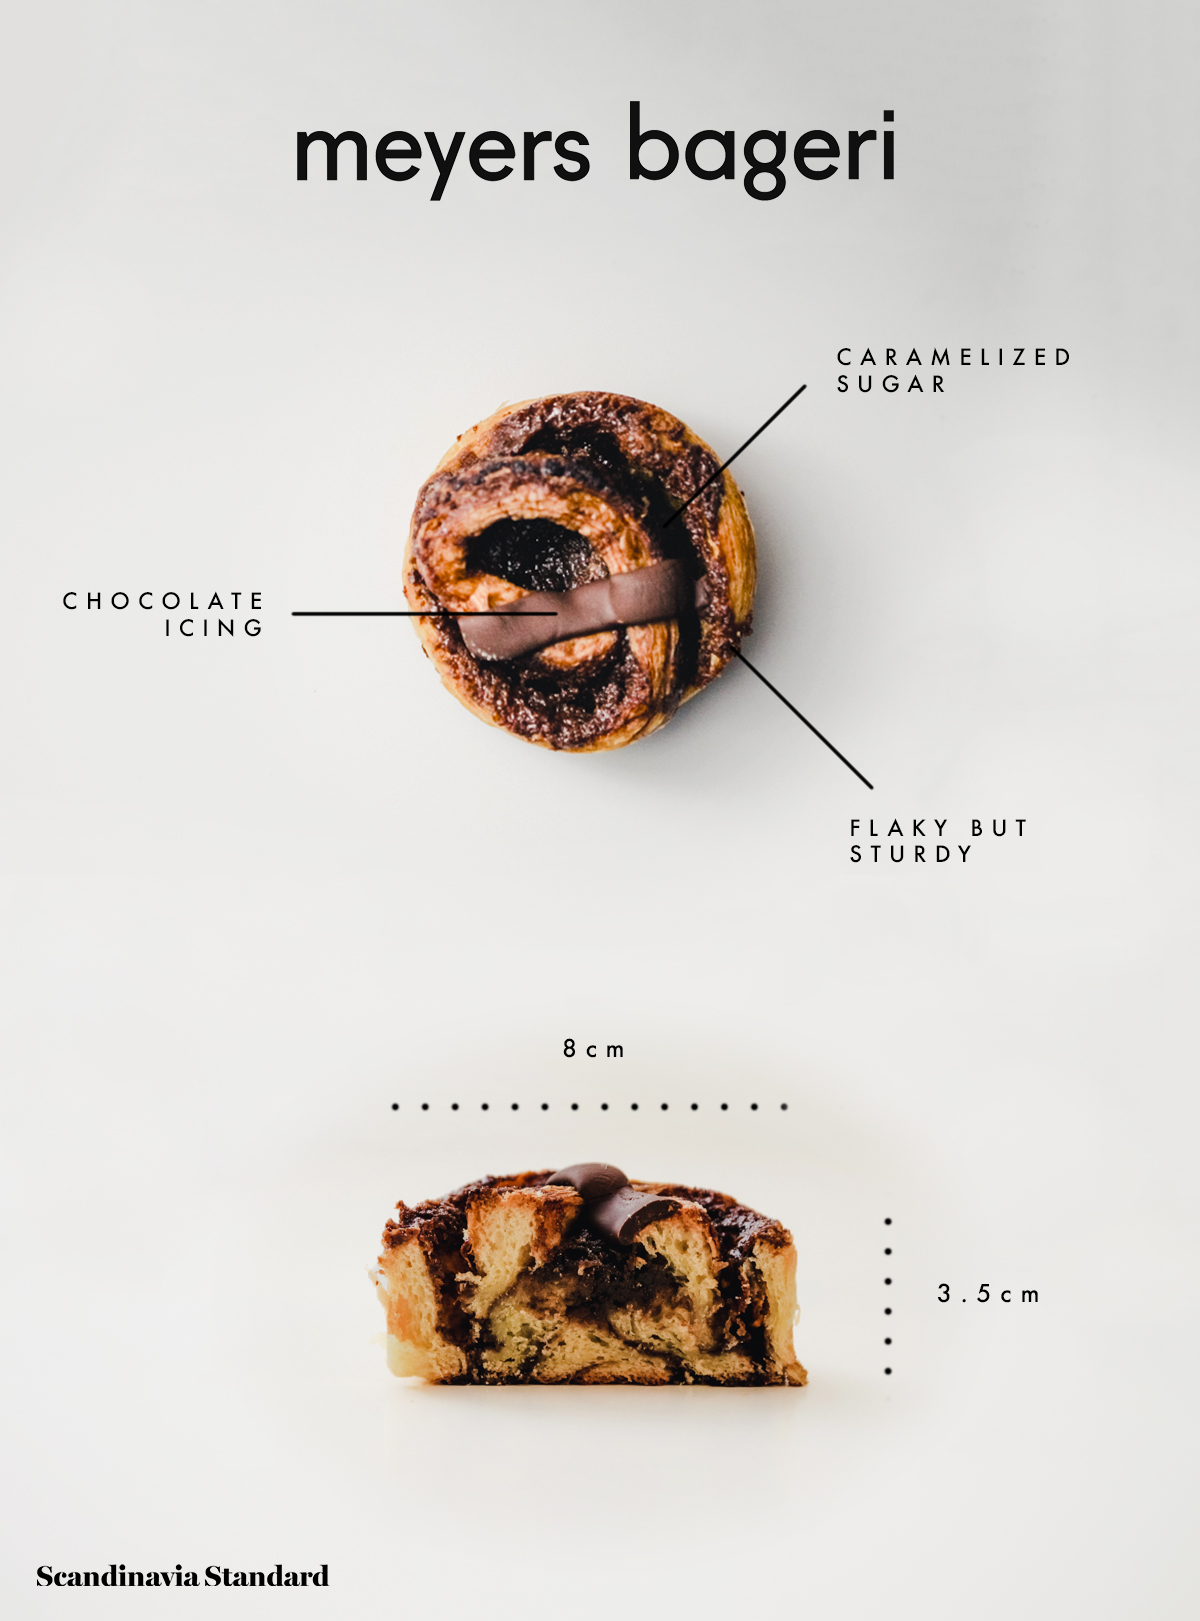 2. Meyers Bageri Cinnamon Bun Kanelsnegle Copenhagen